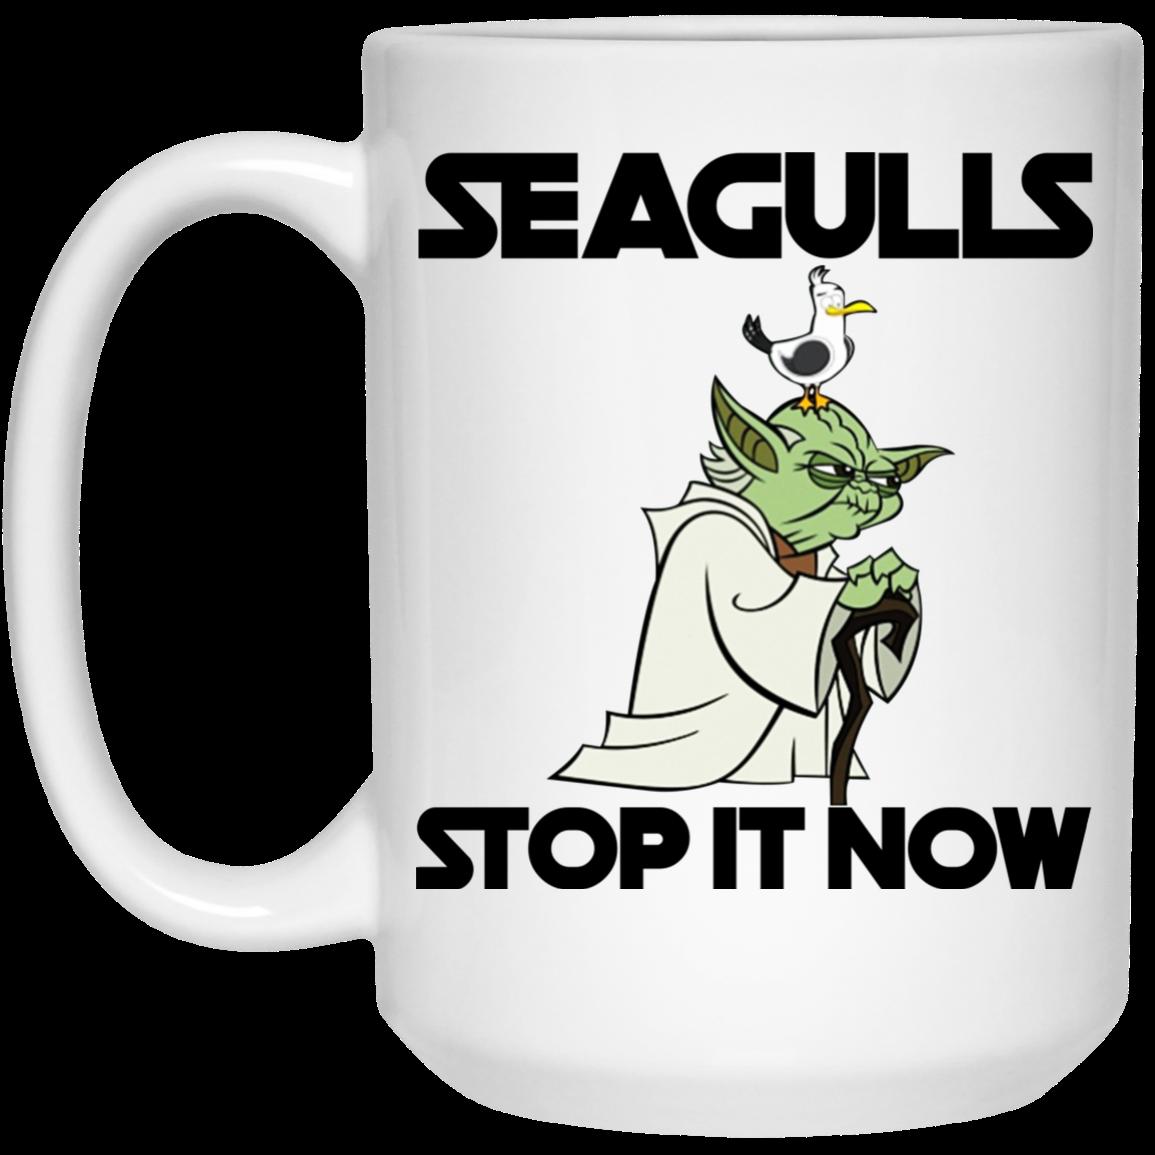 Star Wars: Seagulls Stop It Now Mugs